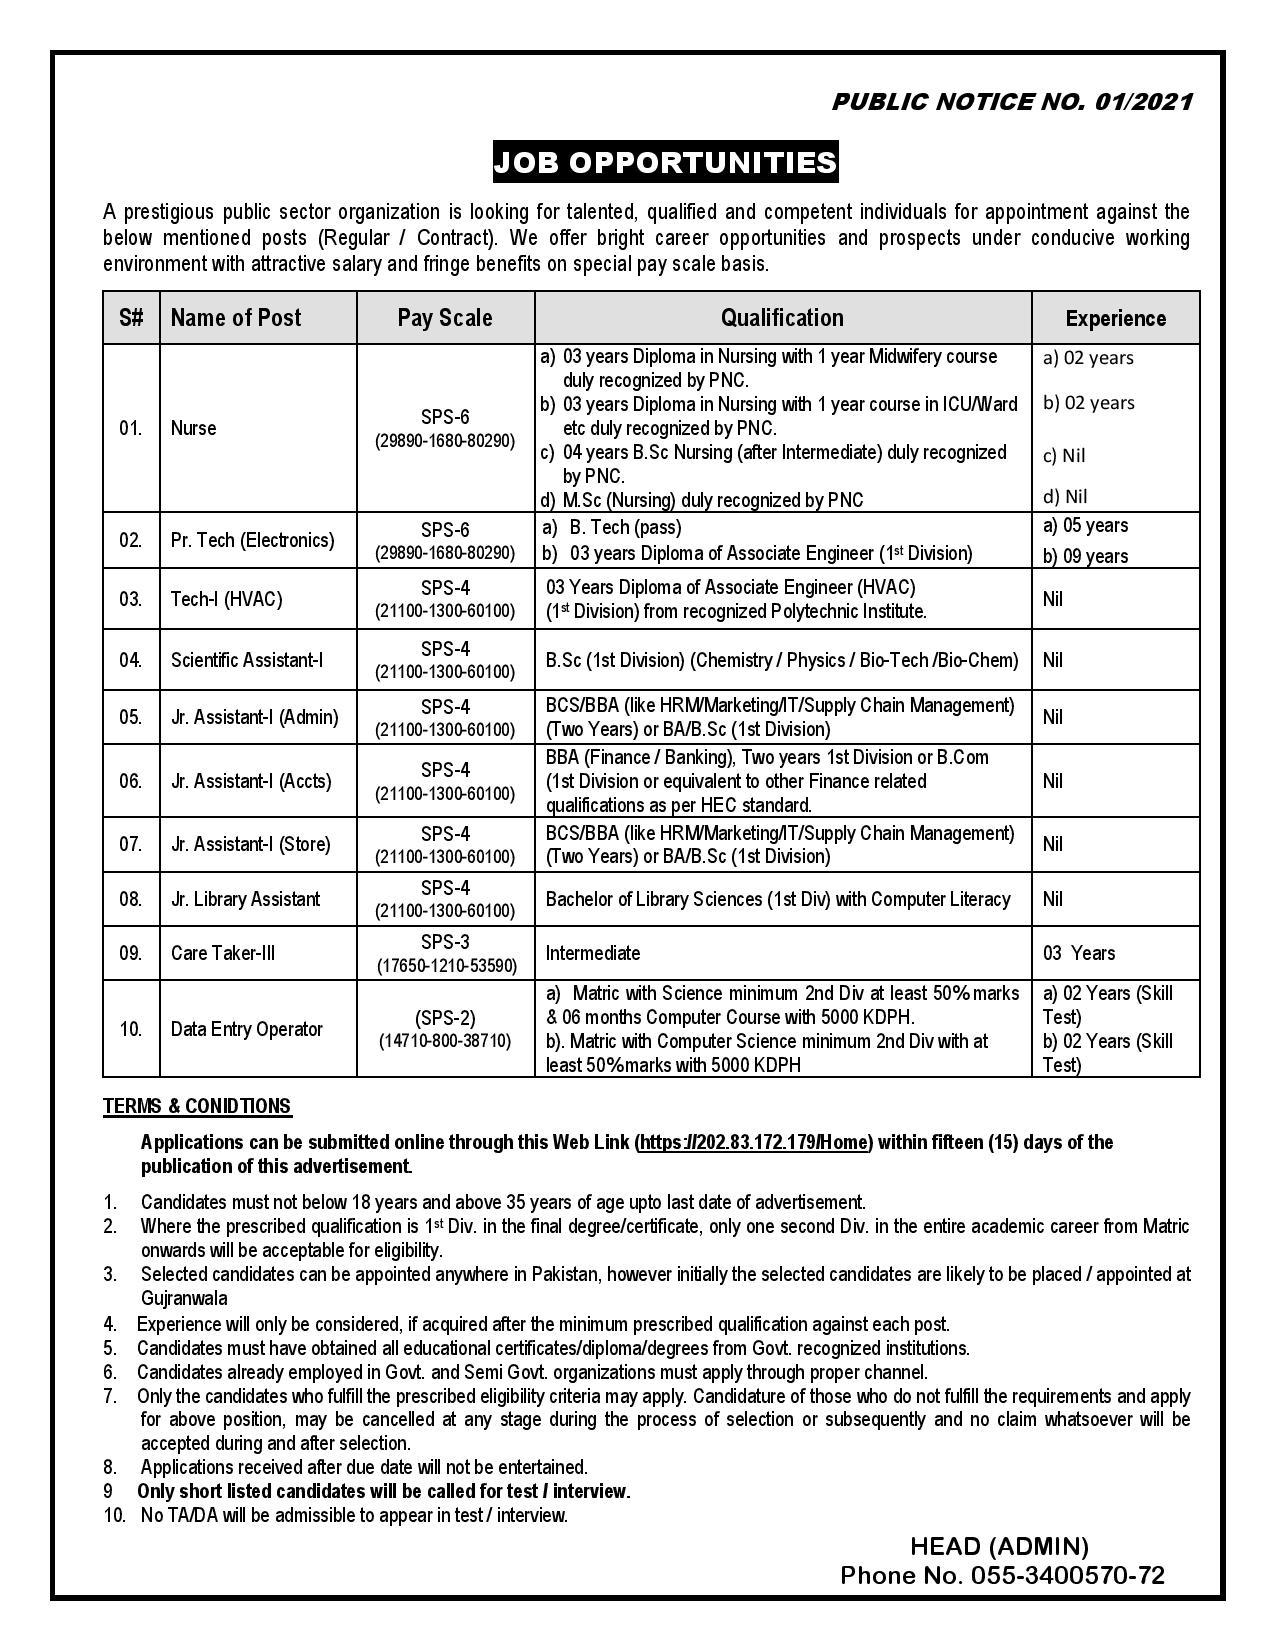 Pakistan Atomic Energy Commission PAEC Jobs 2021|Latest Jobs |Apply Online